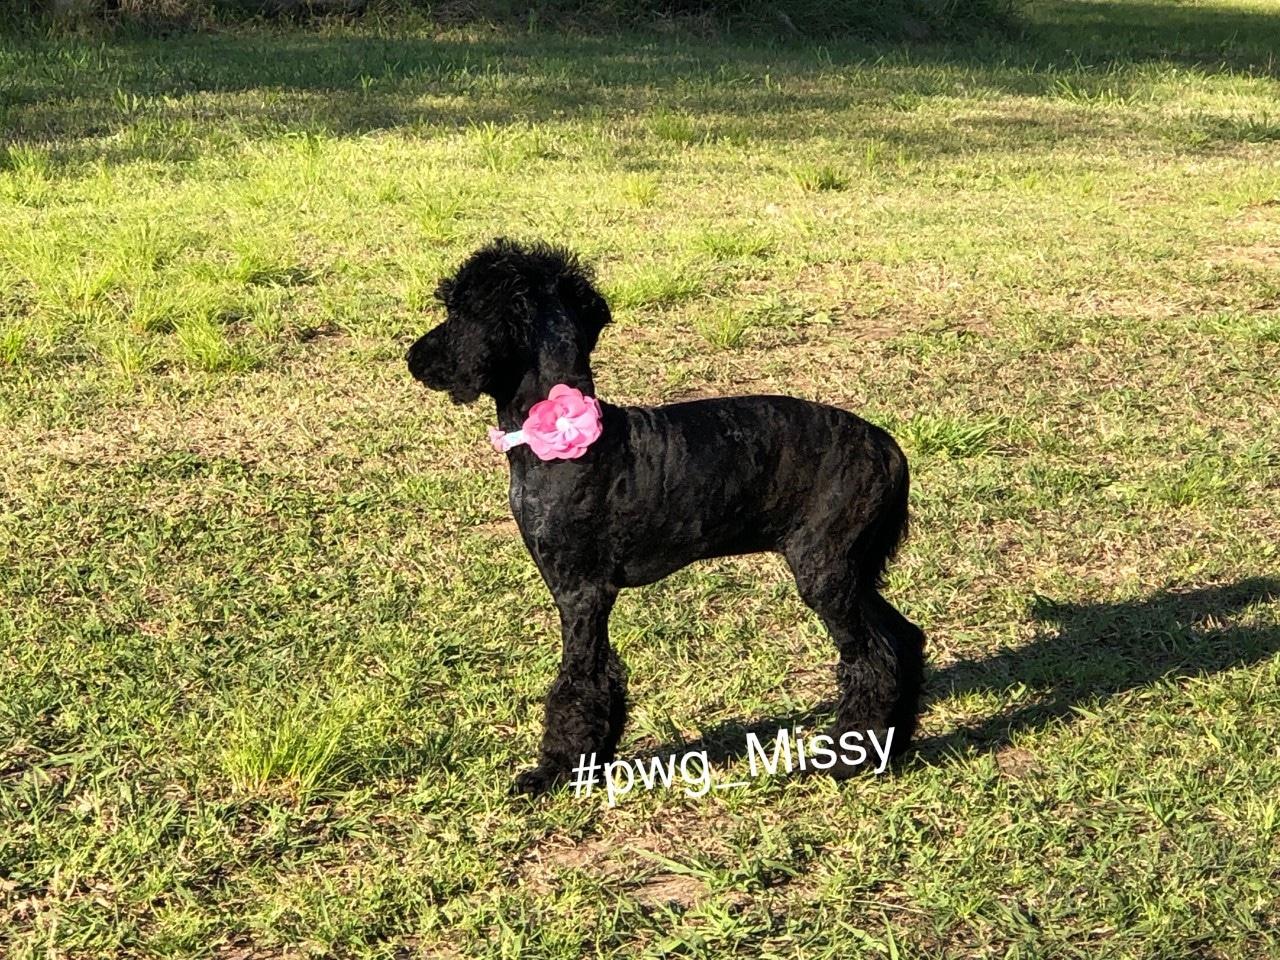 pwg_missy poodle for sale